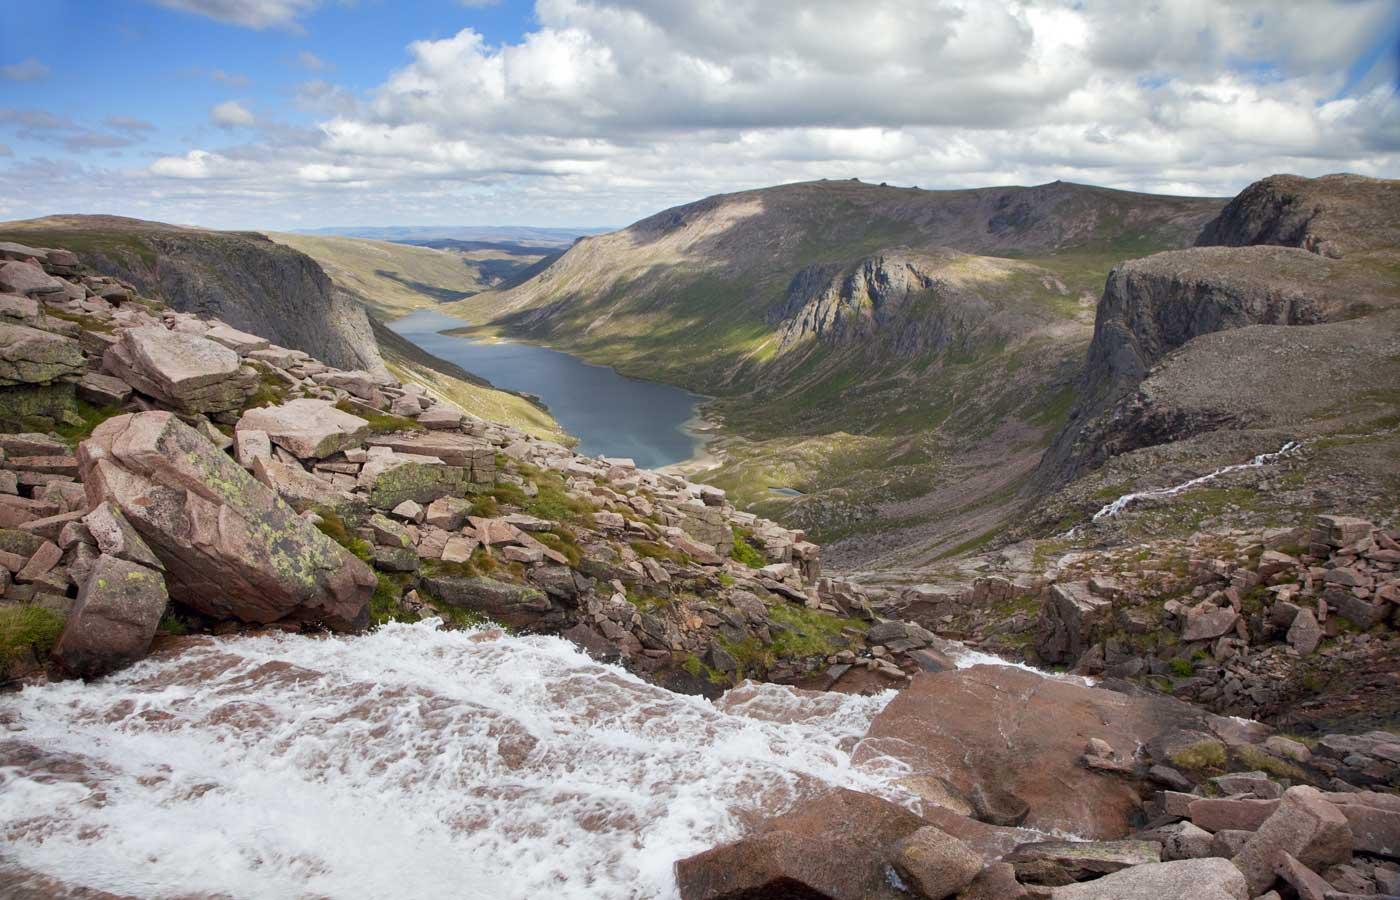 Photo via cairngorms.co.uk